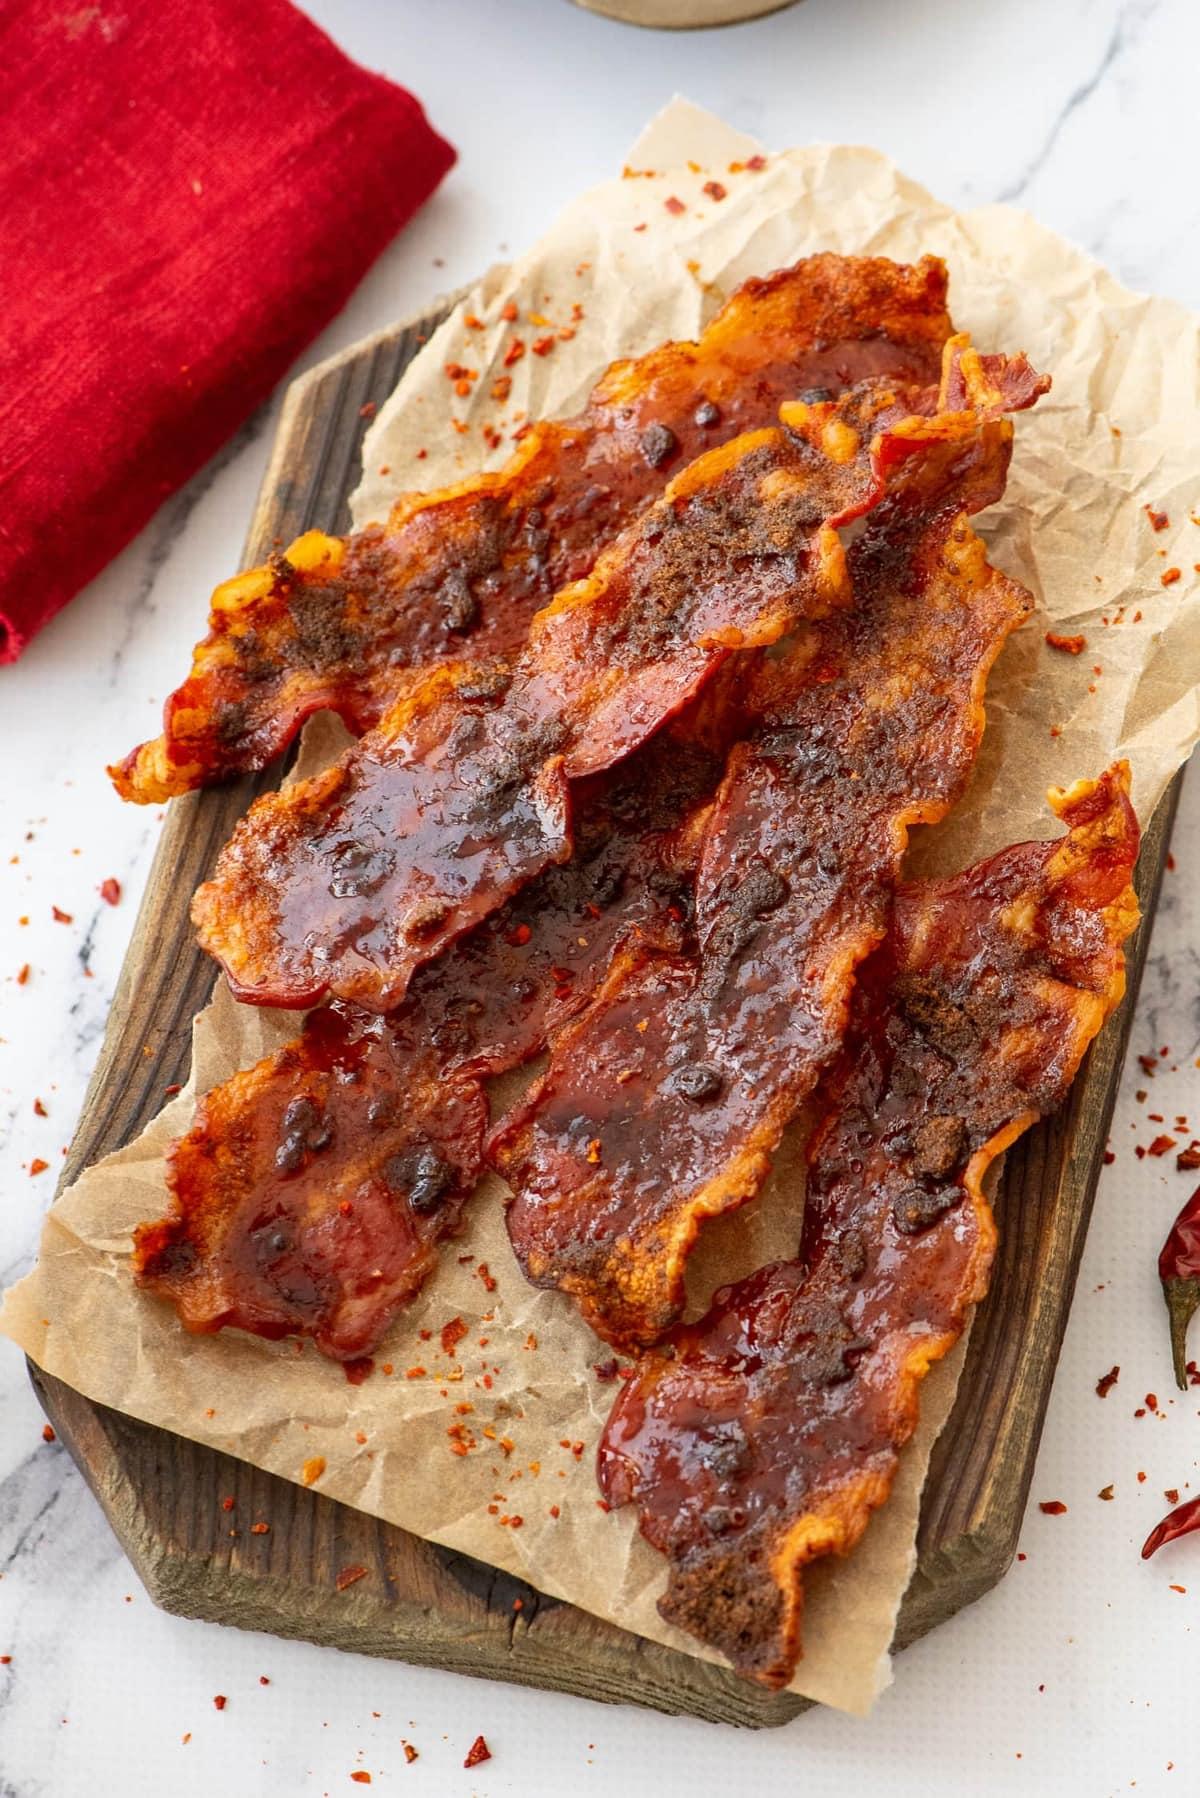 strips of bacon on a wood board